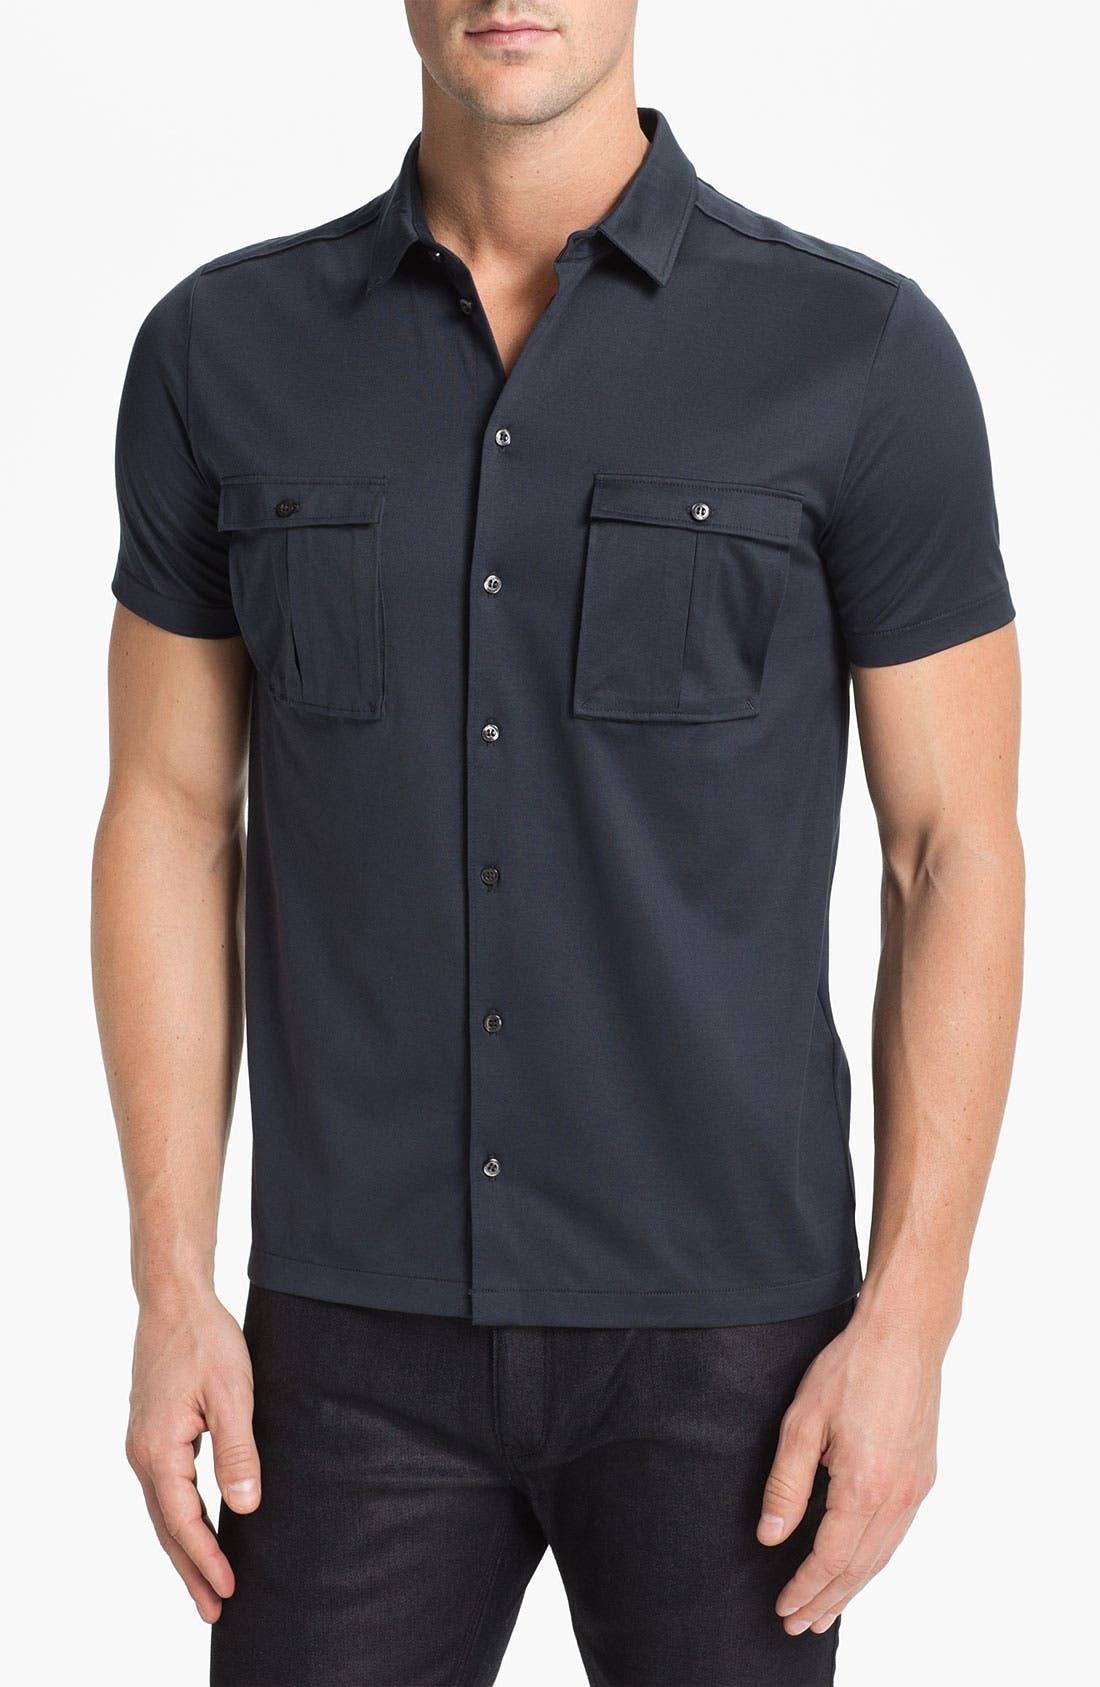 Alternate Image 1 Selected - HUGO 'Danalog' Knit Sport Shirt